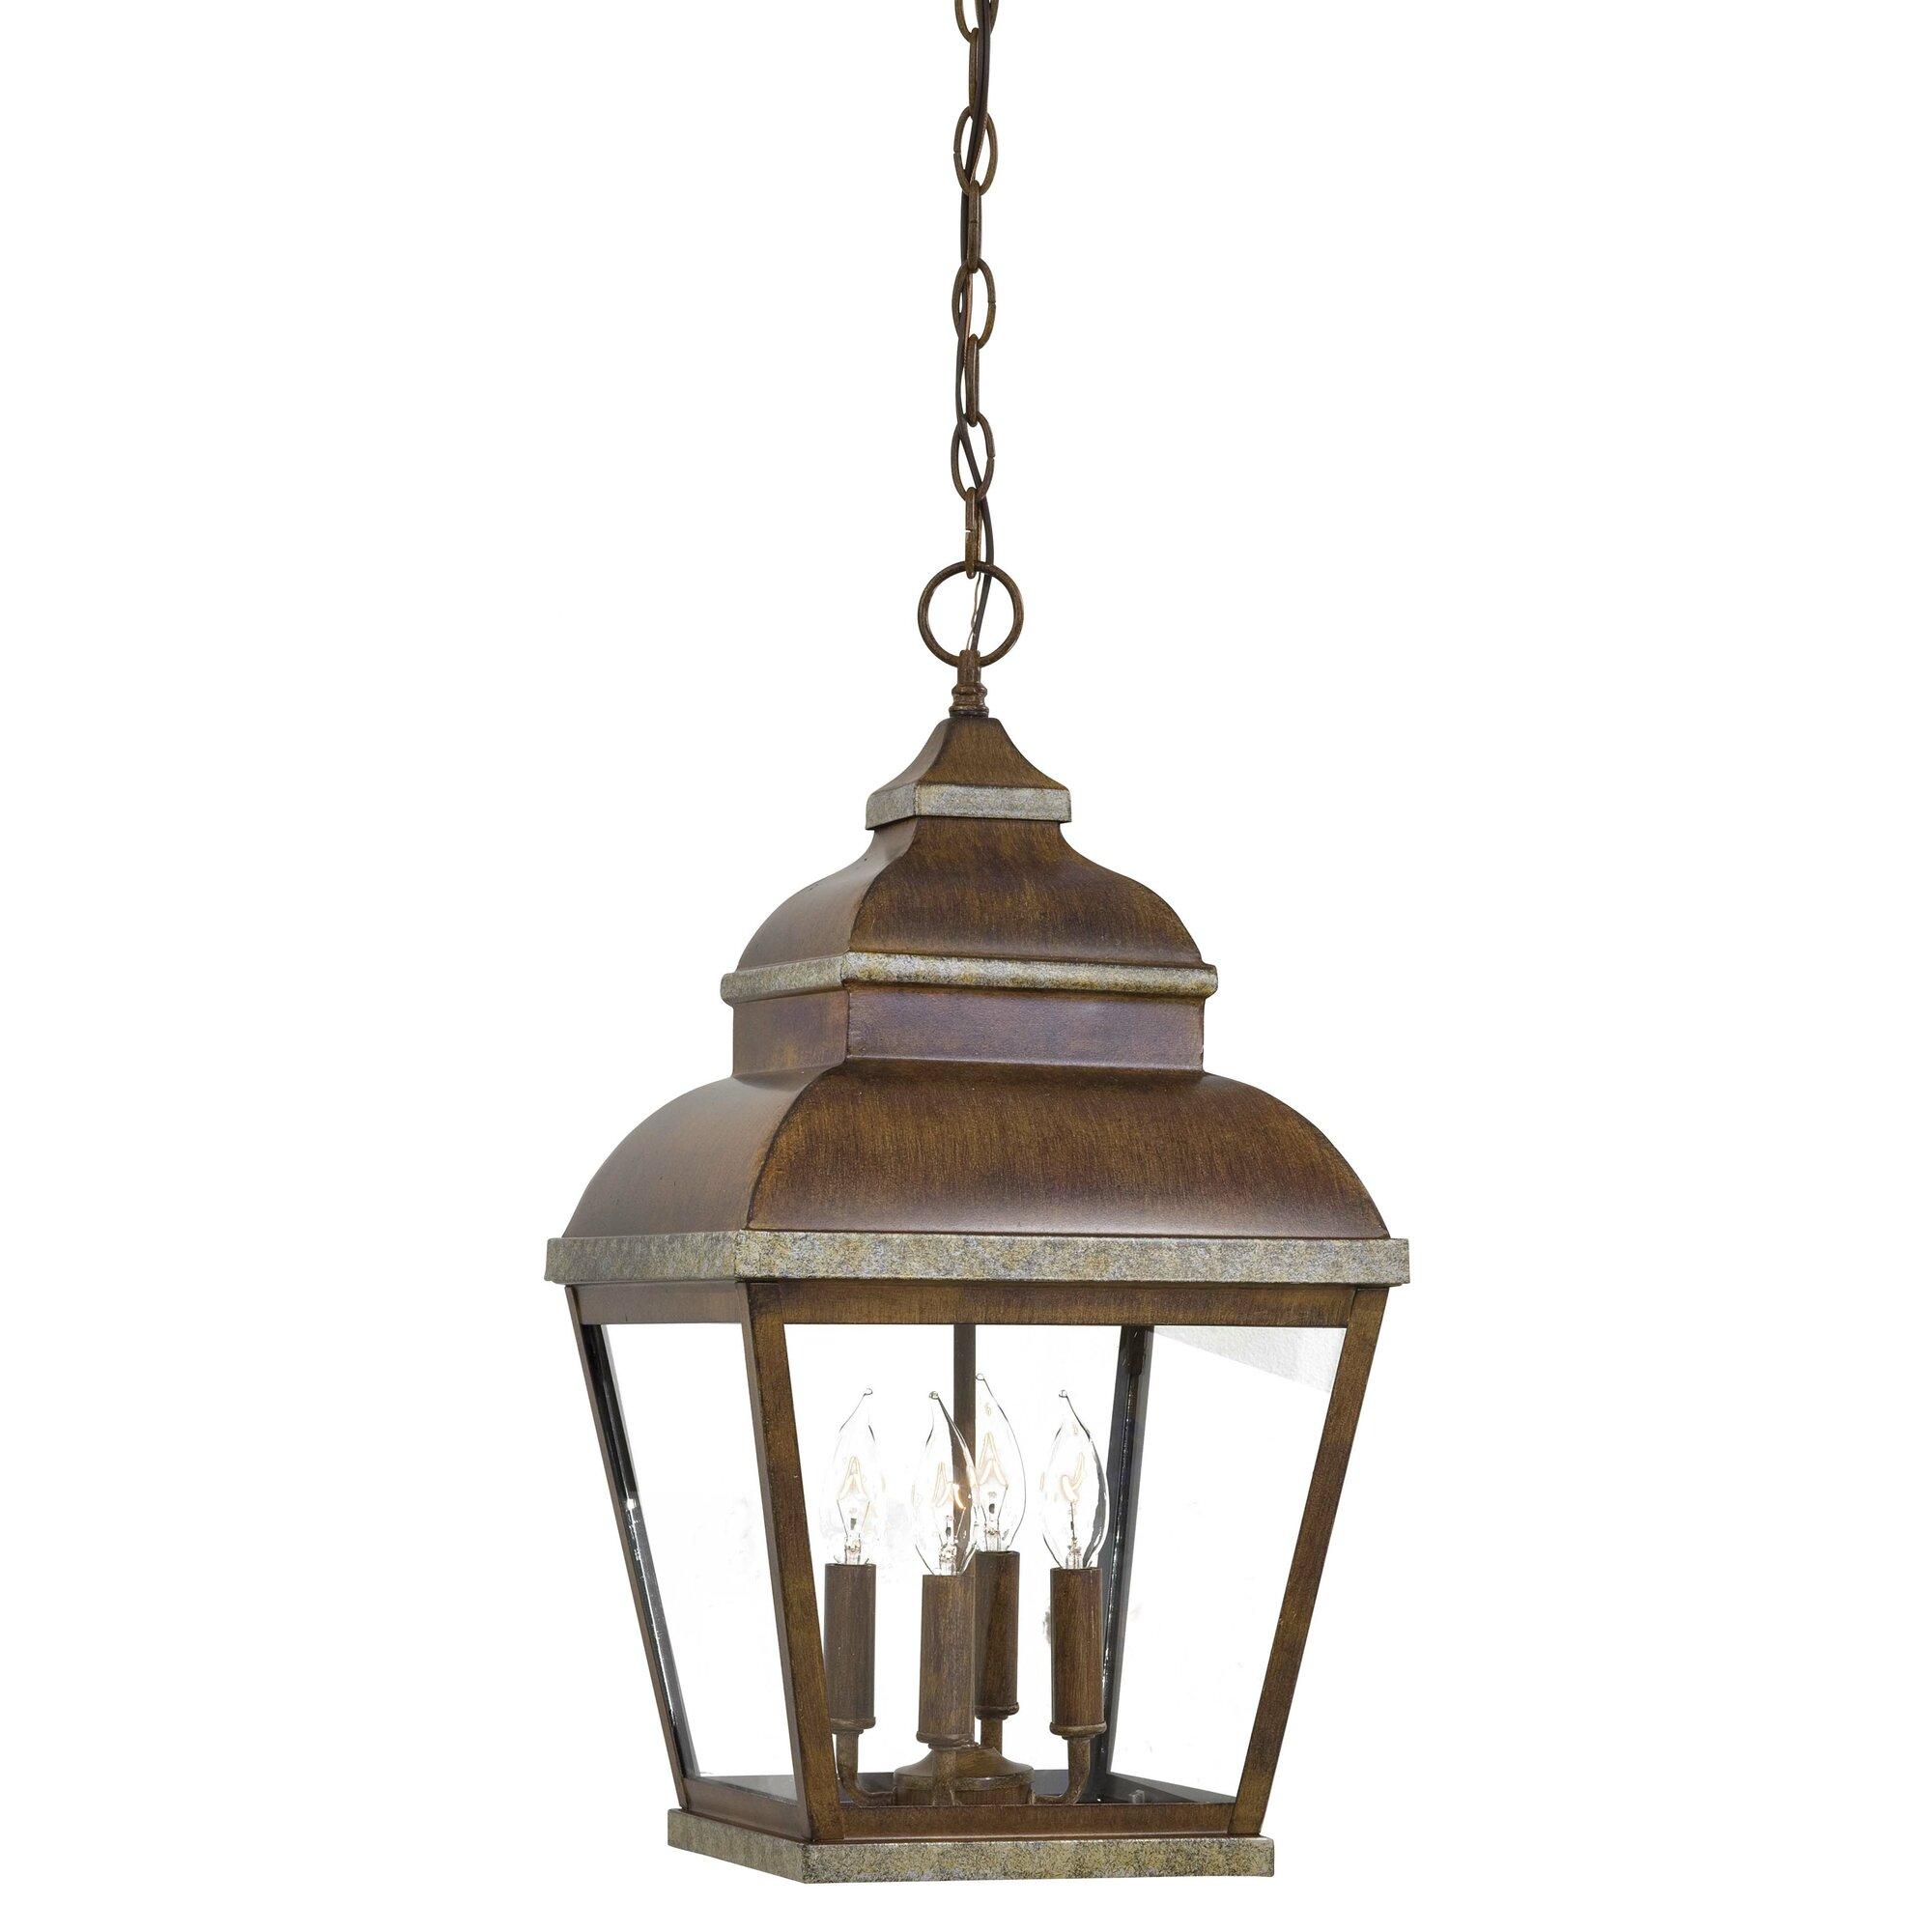 Outdoor hanging lamp - Mossoro 4 Light Outdoor Hanging Lantern